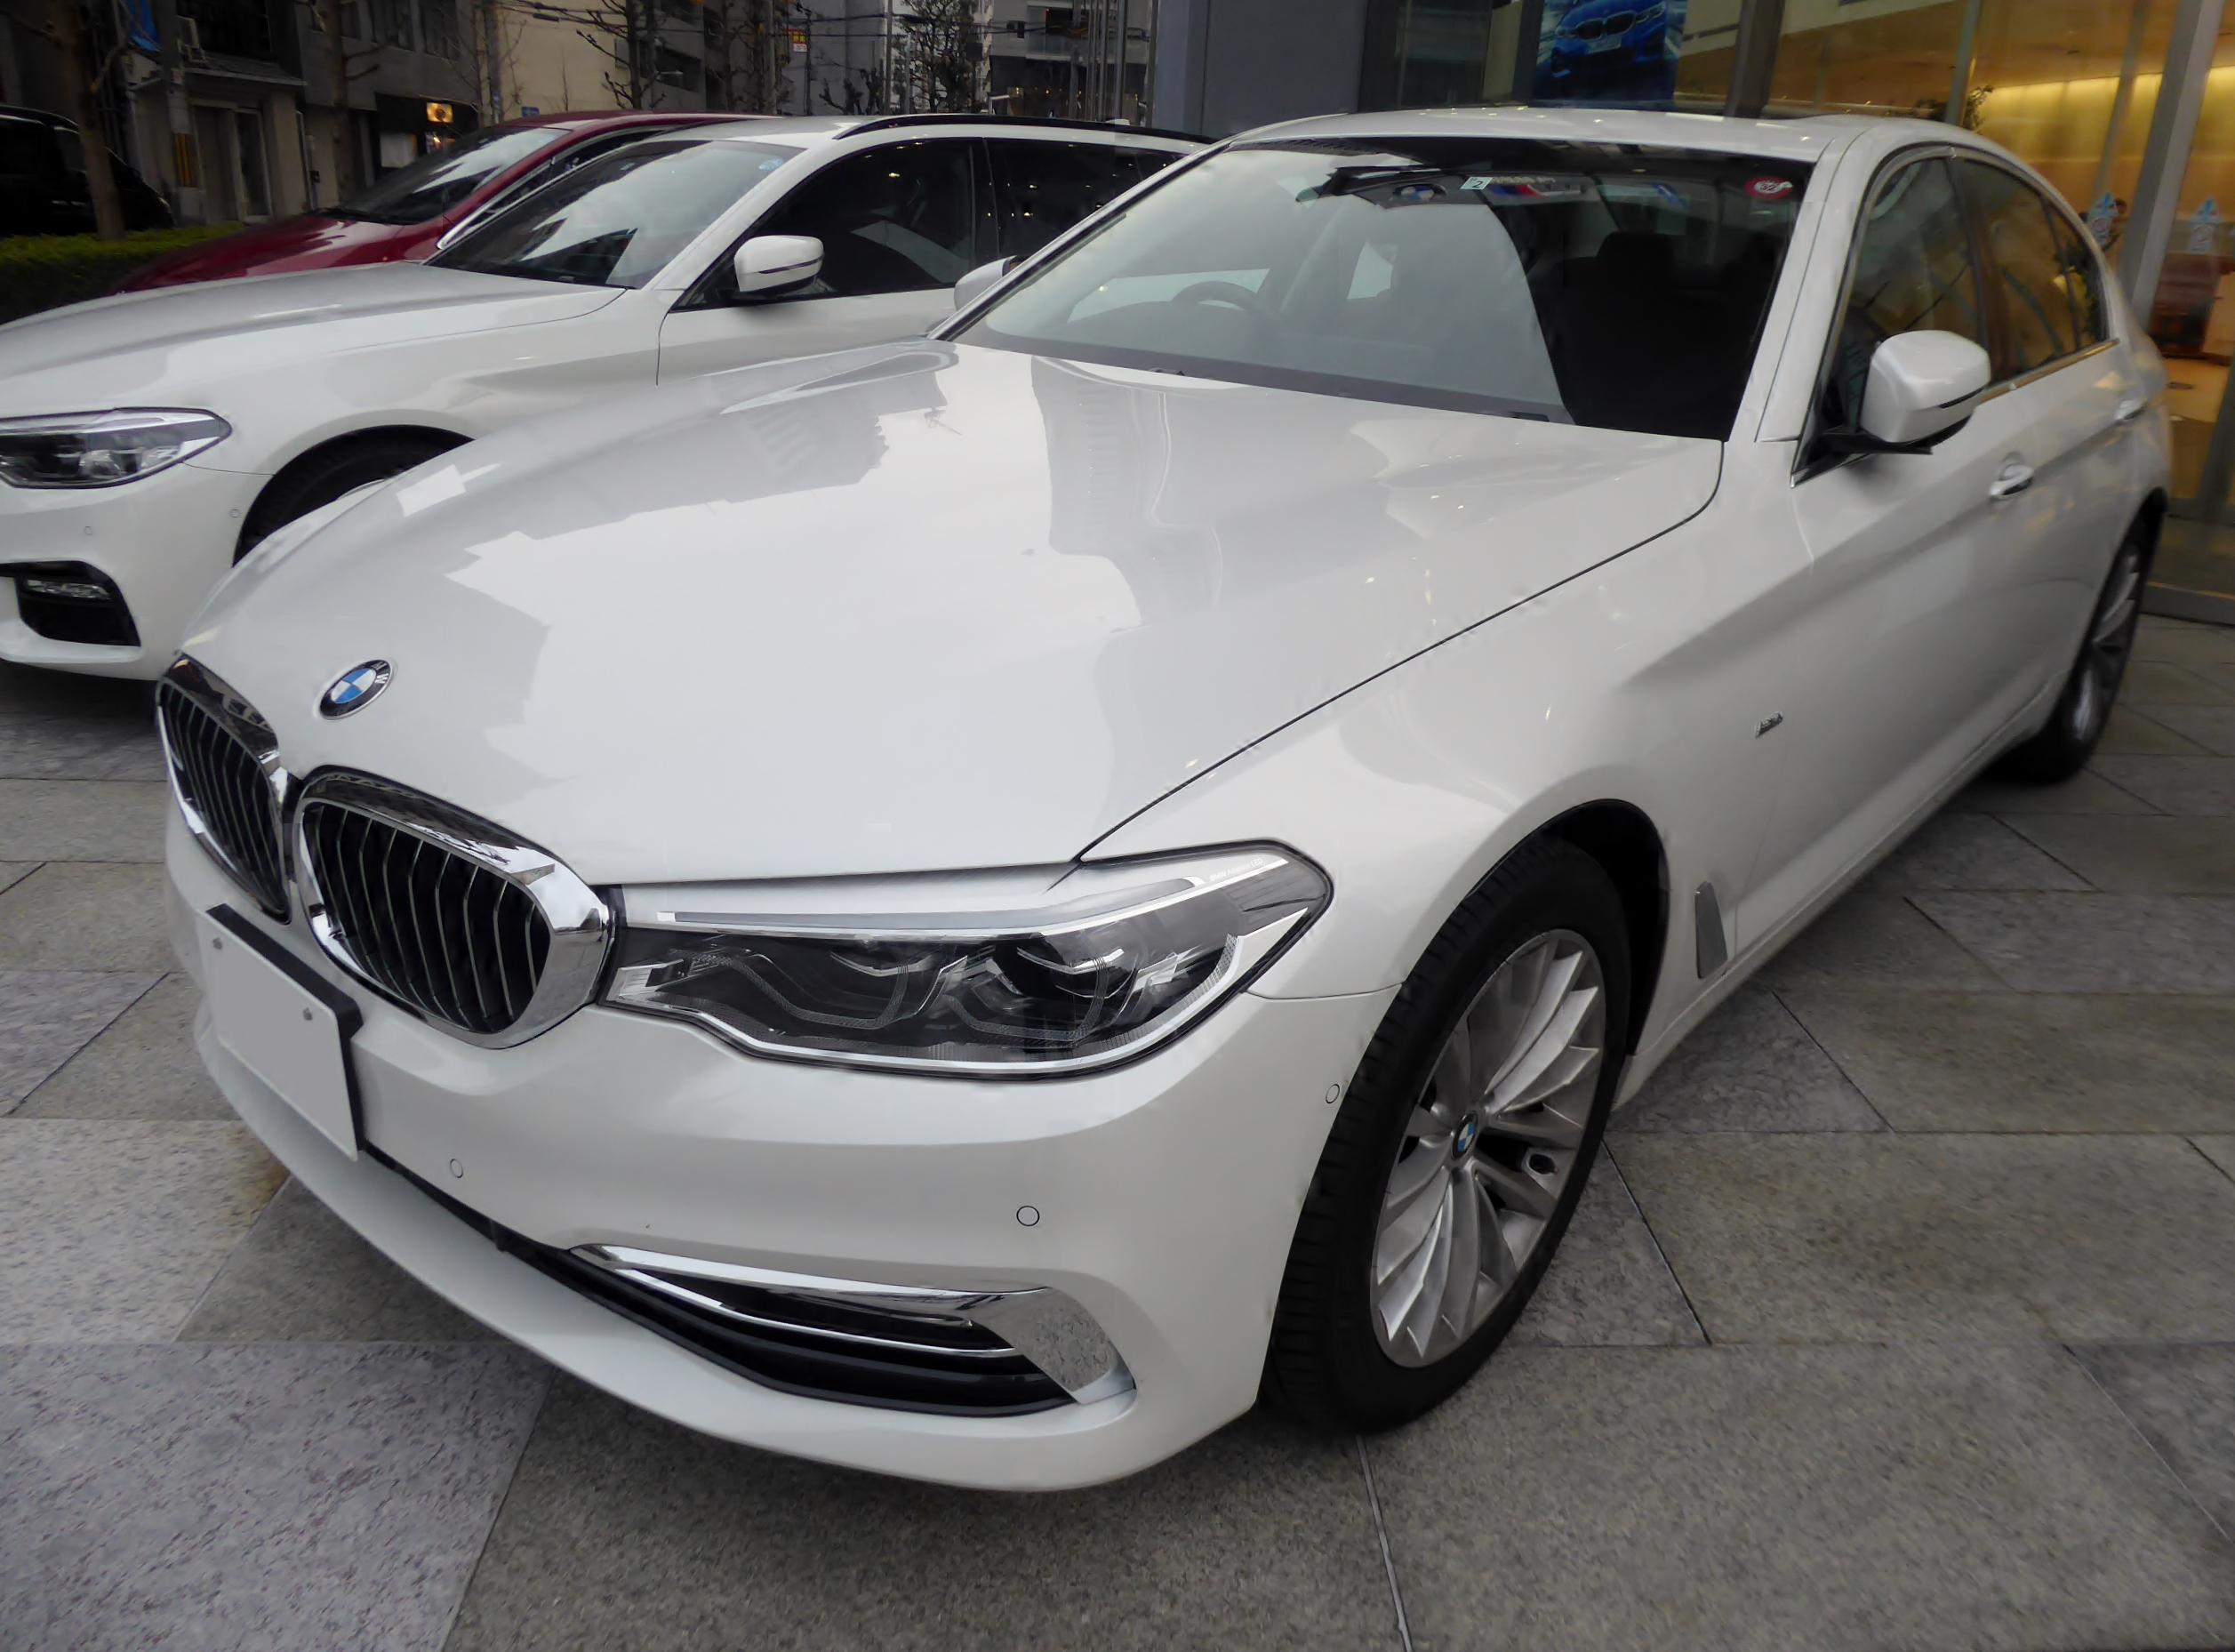 File:BMW 523i Luxury (G30) front jpg - Wikimedia Commons